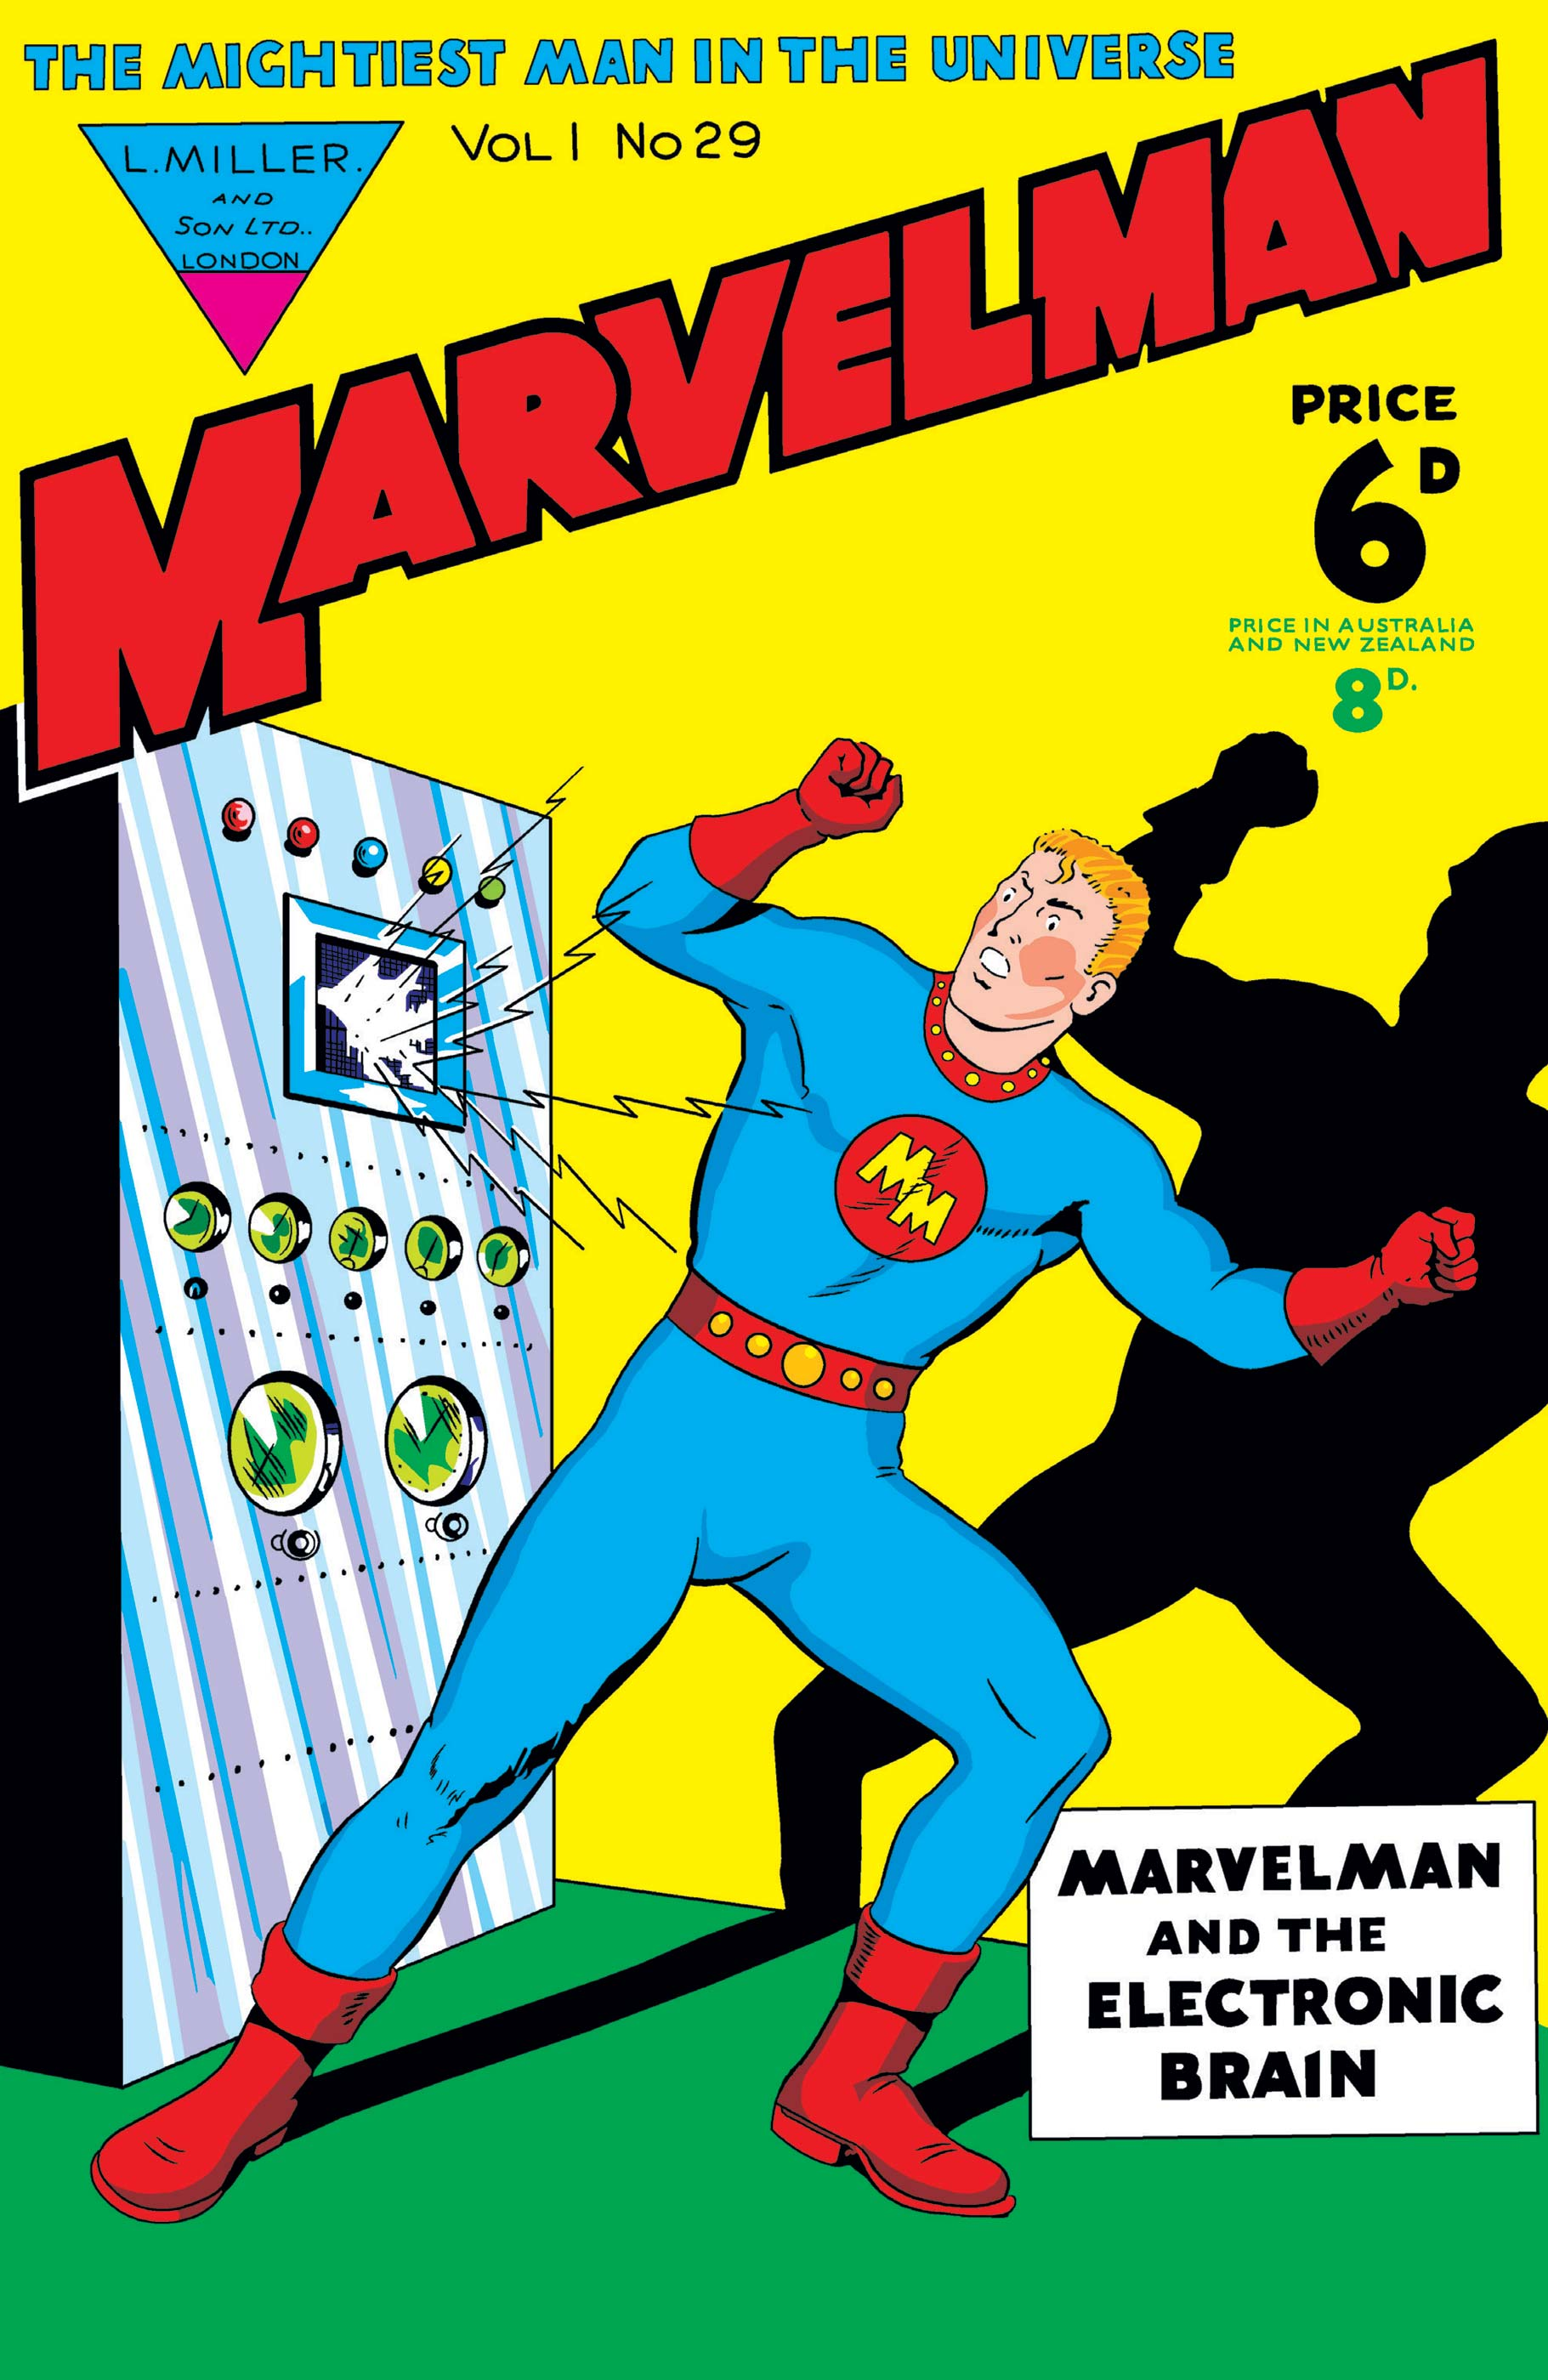 Marvelman (1954) #29